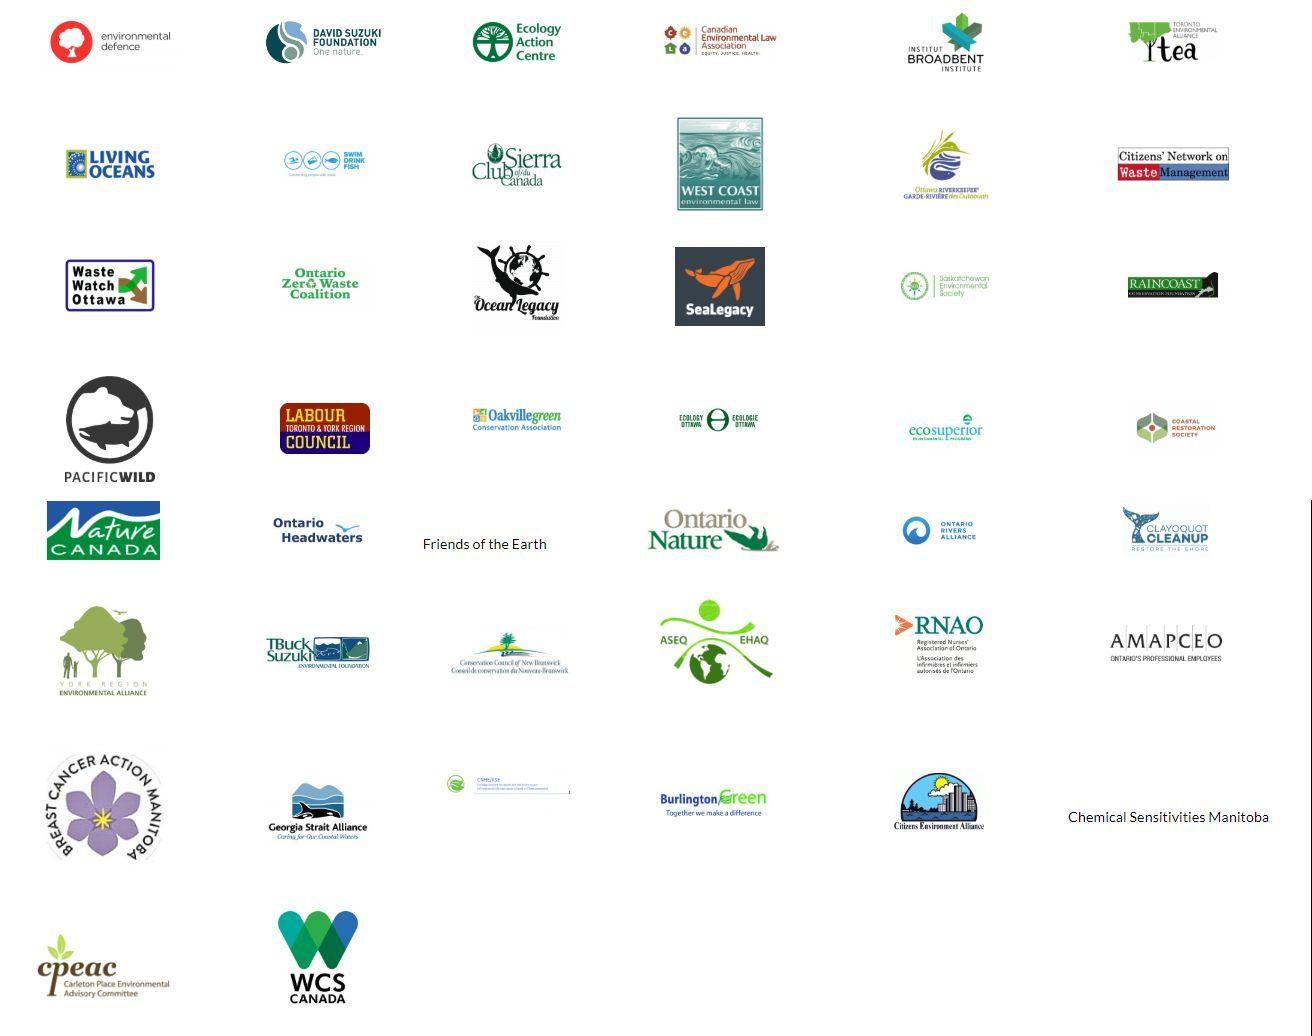 Towards a zero plastic waste Canada   Ontario Nature